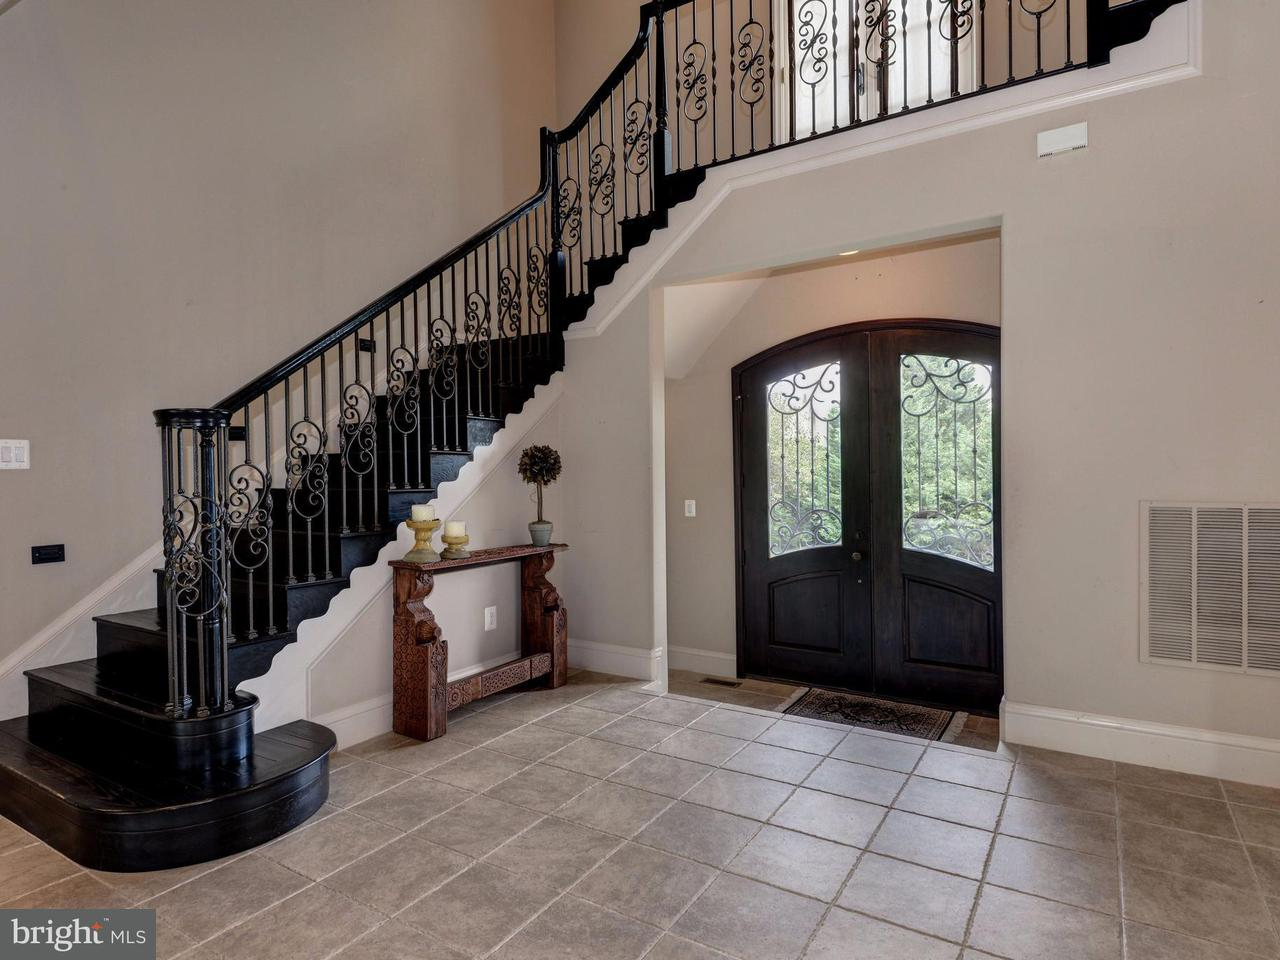 Single Family Home for Sale at 14318 TRAVILAH Road 14318 TRAVILAH Road Rockville, Maryland 20850 United States